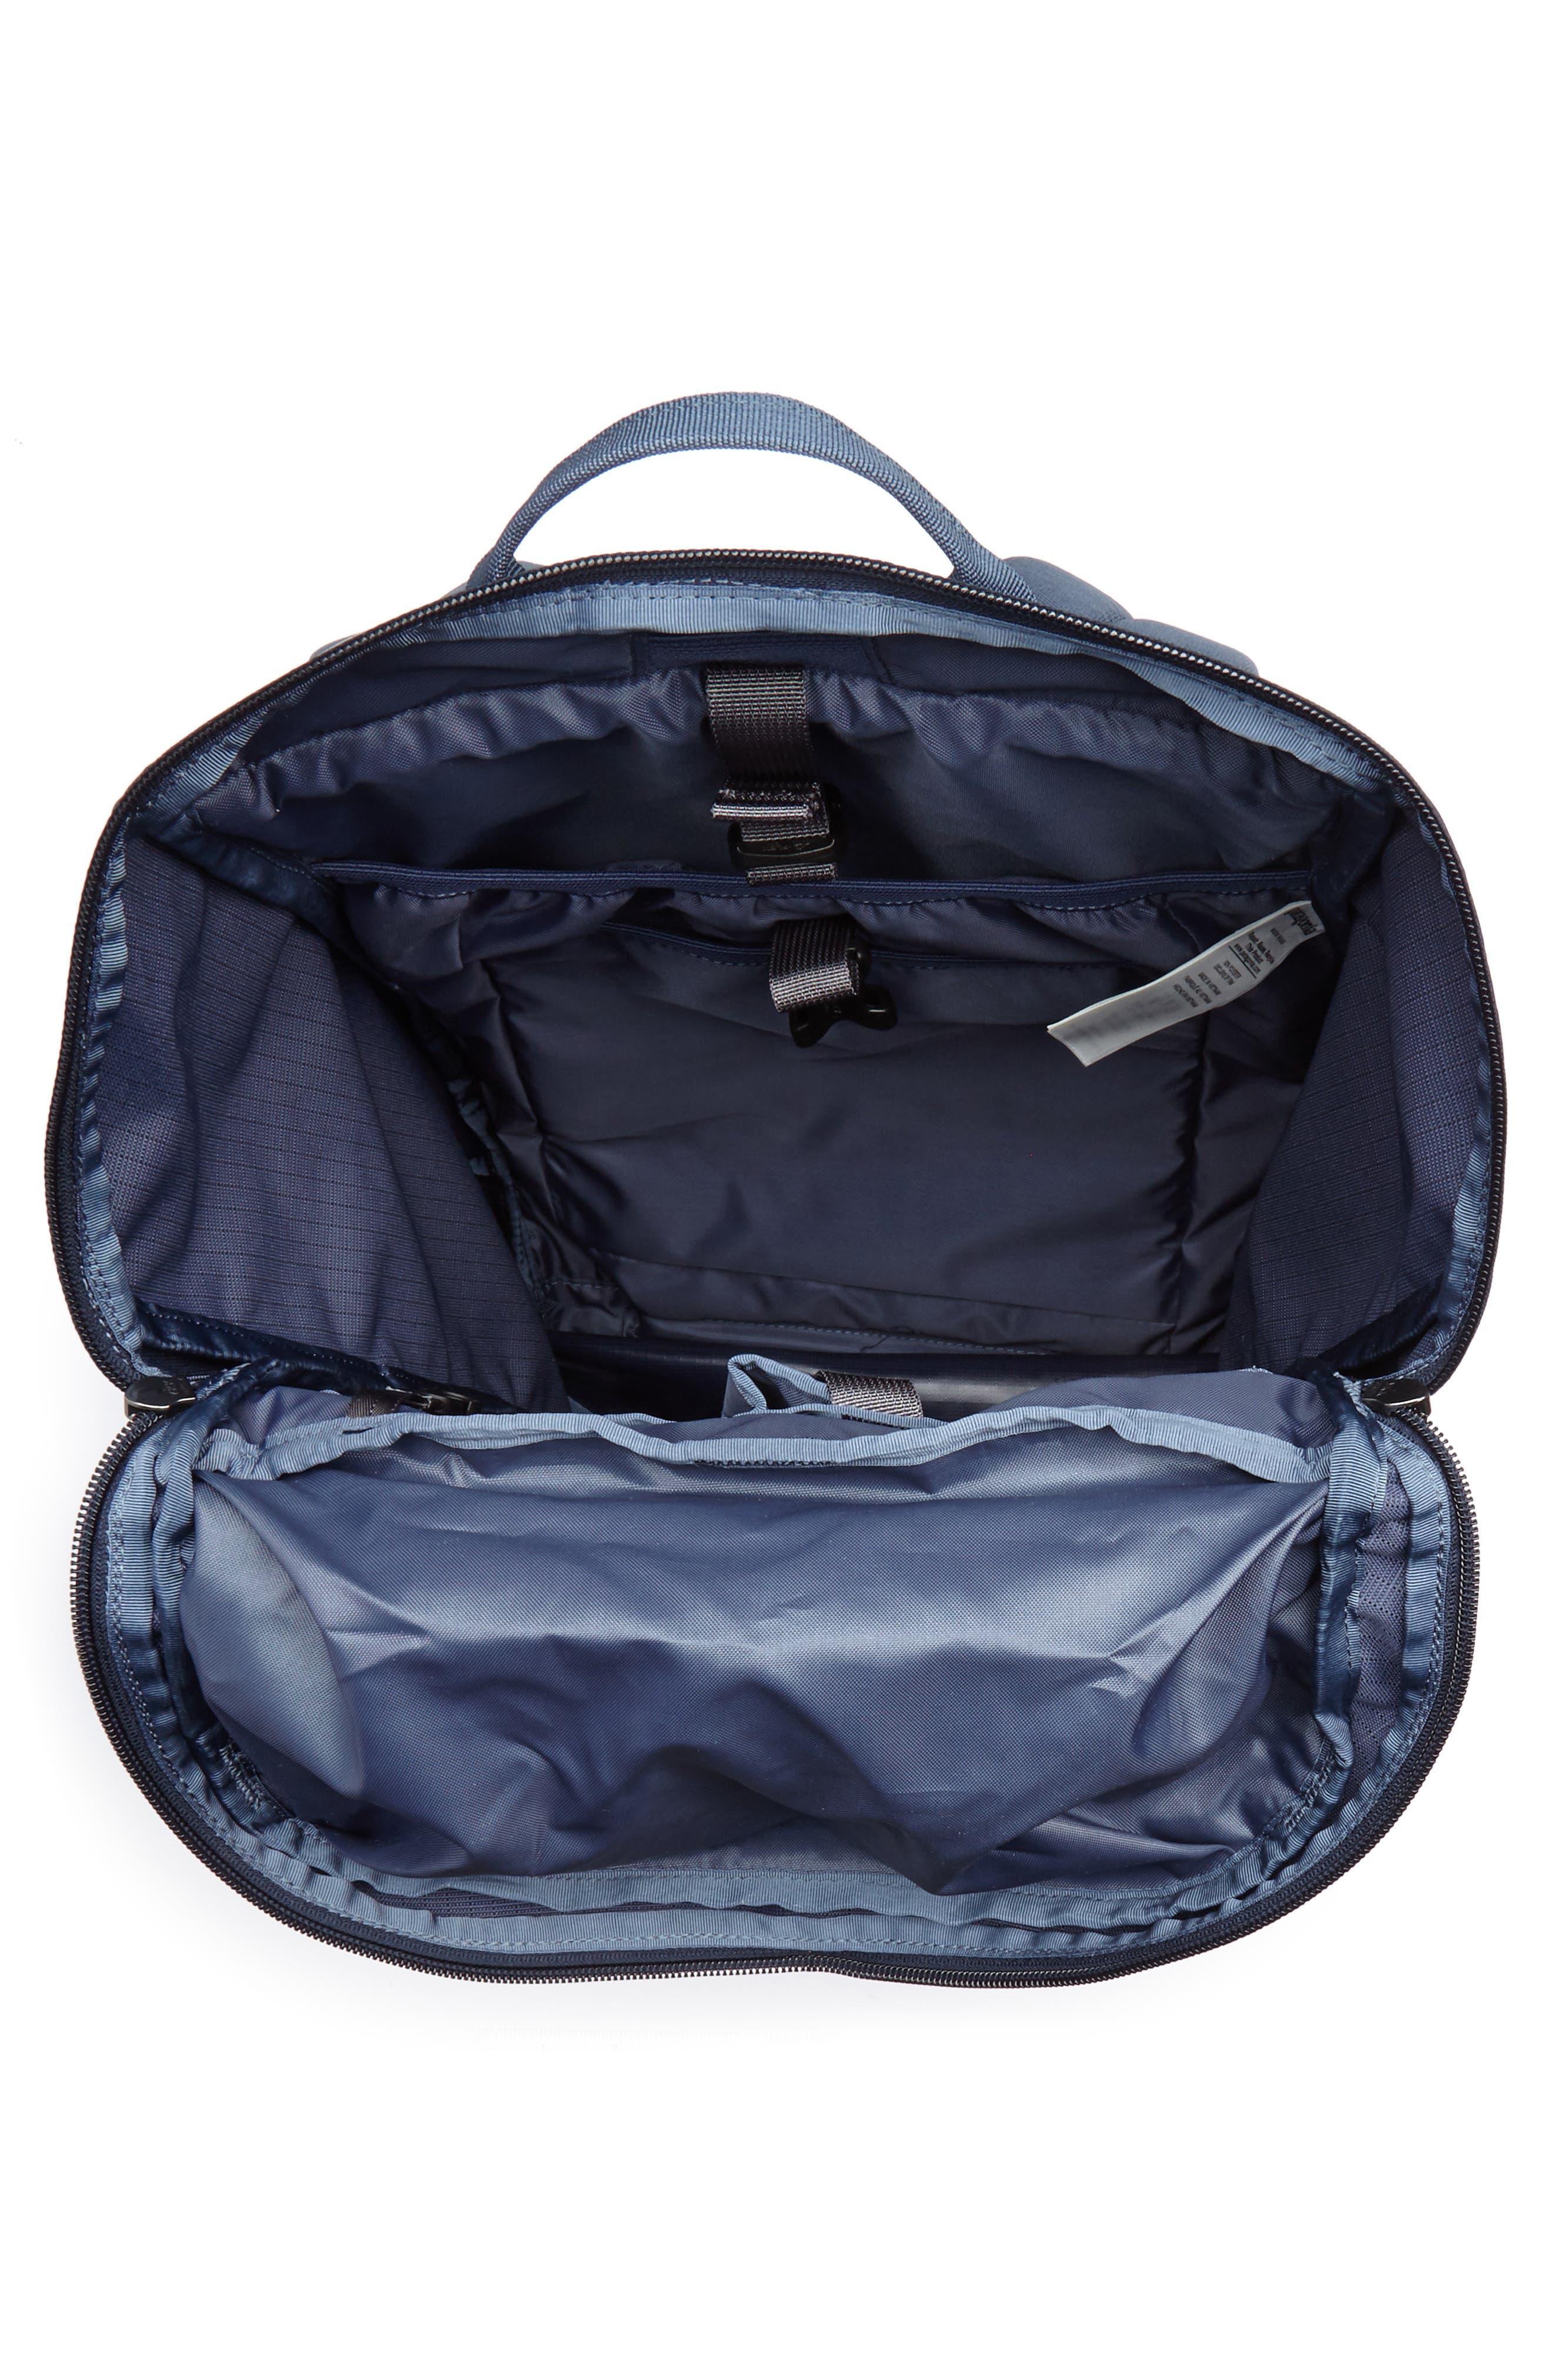 Black Hole 25 Liter Backpack,                             Alternate thumbnail 4, color,                             DOLOMITE BLUE